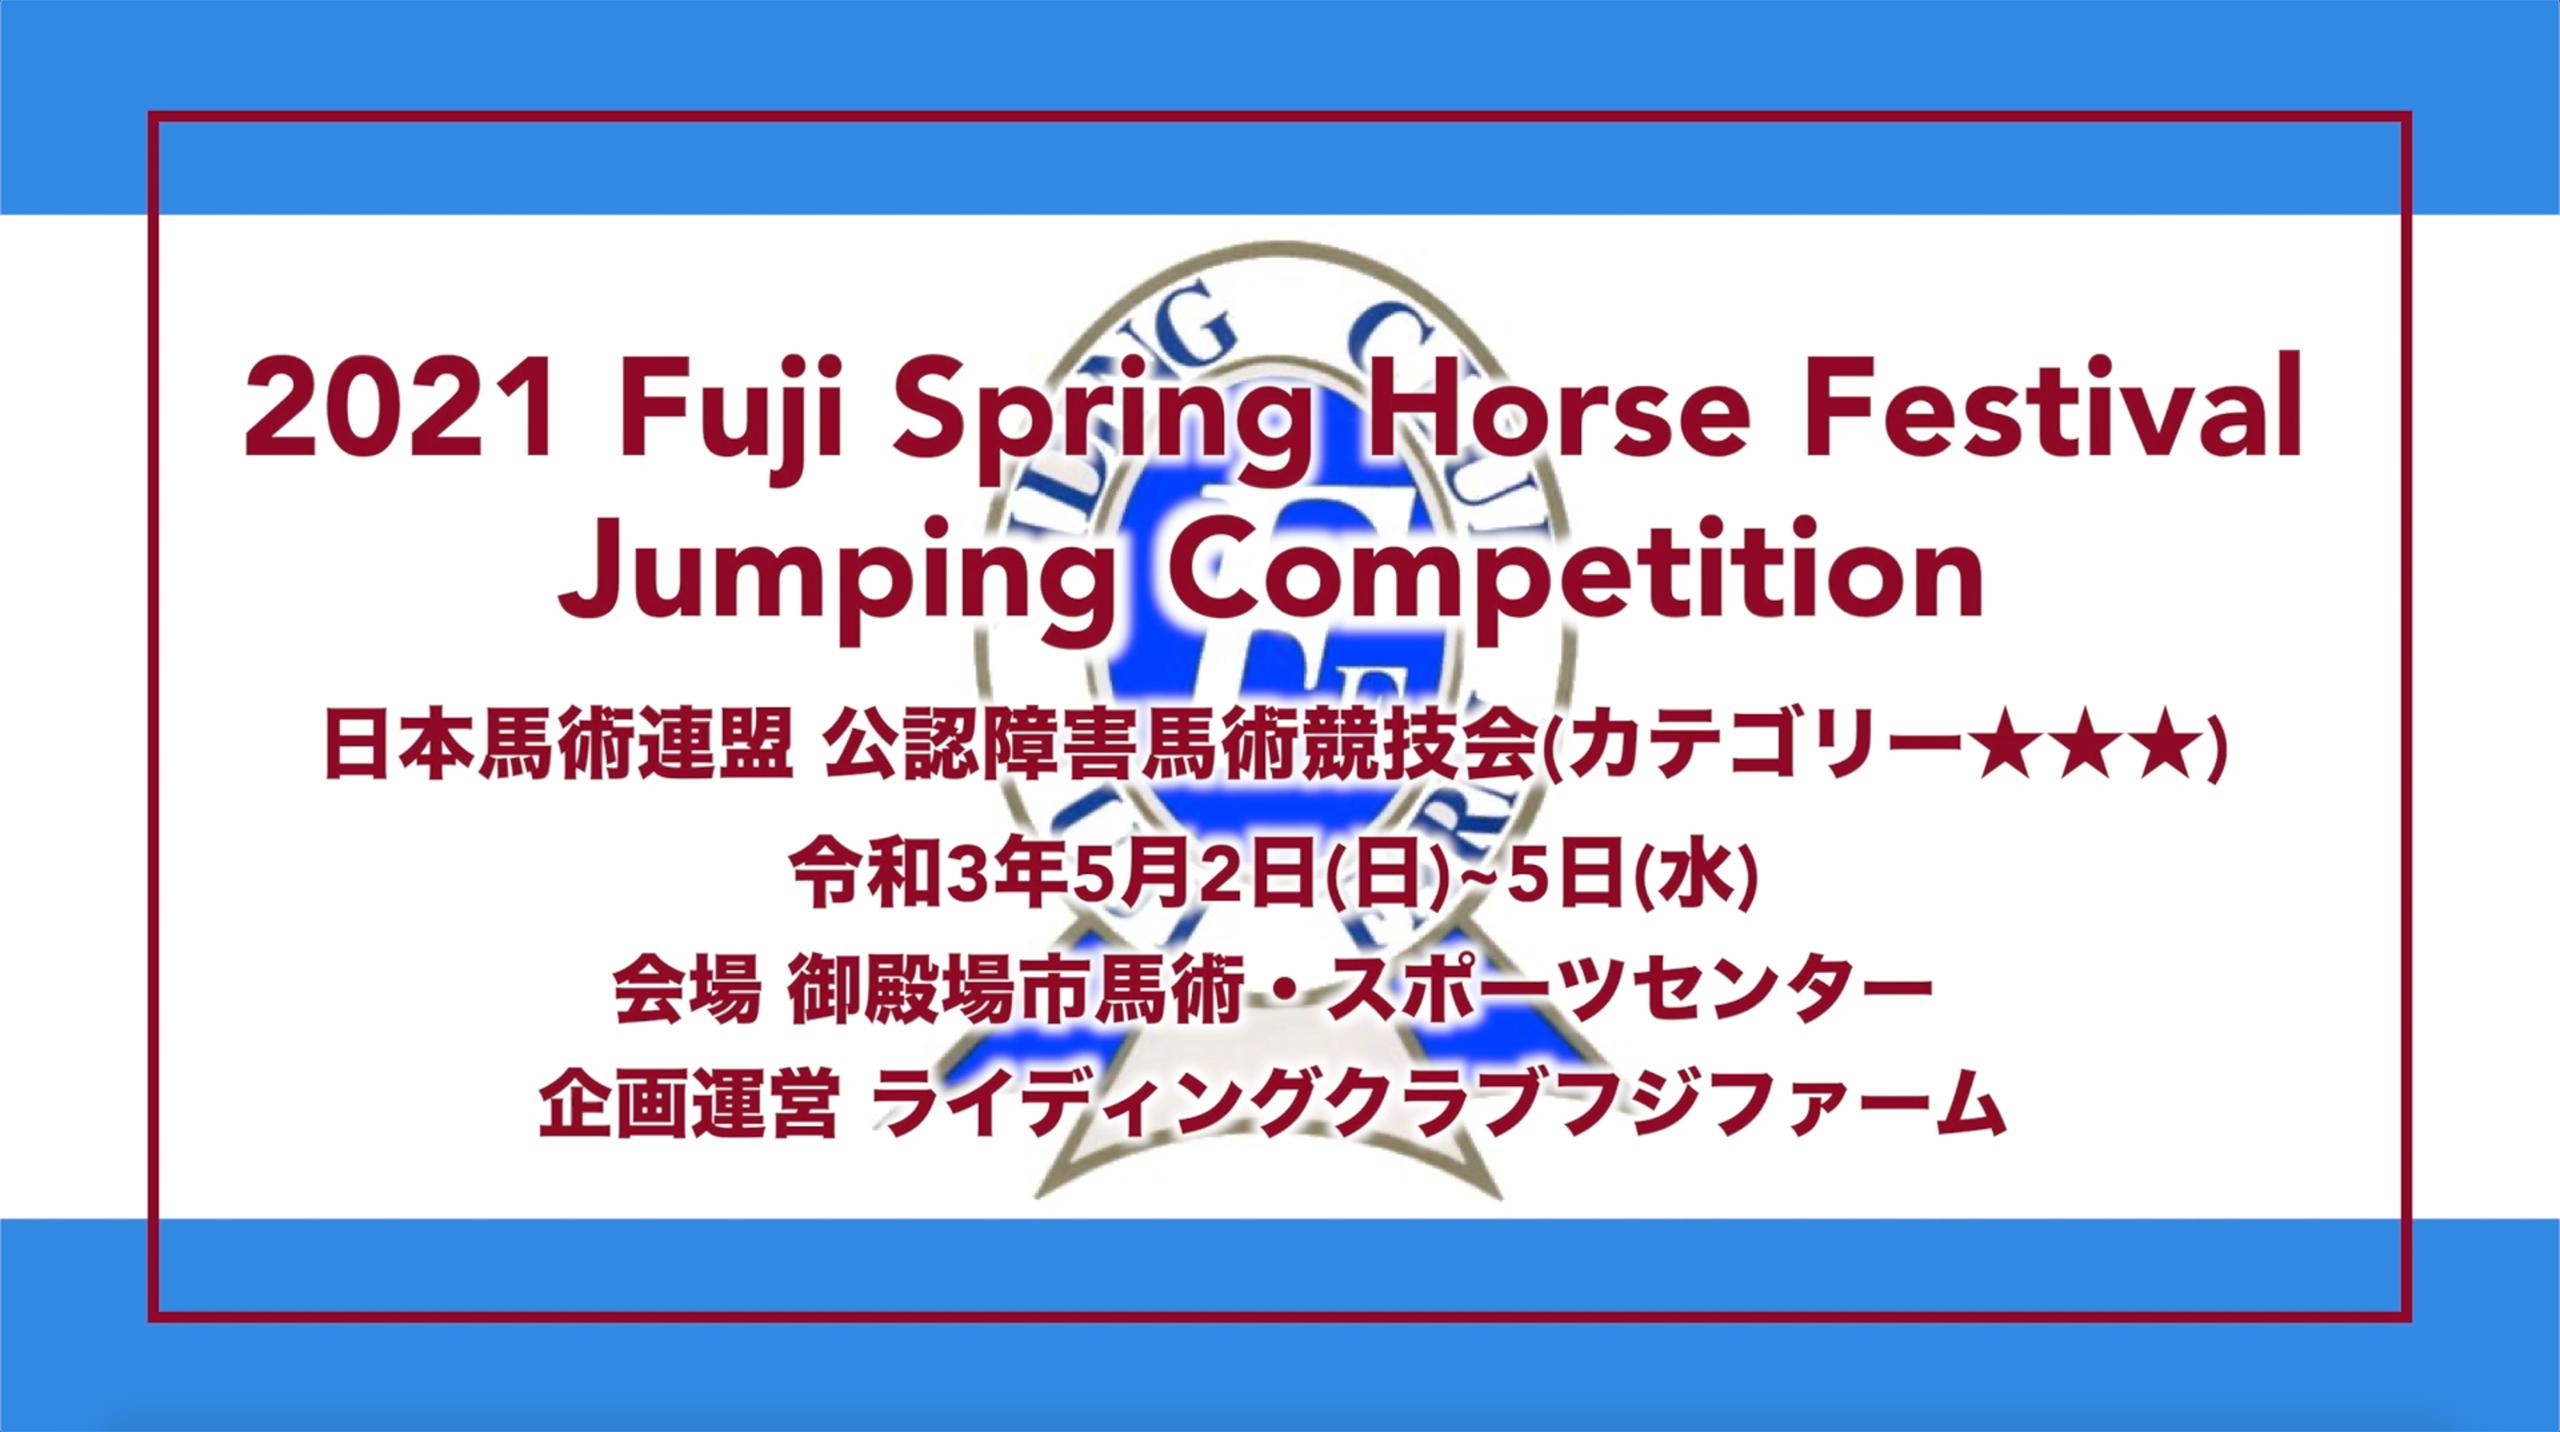 Fuji Spring Horse Festival 2021.5